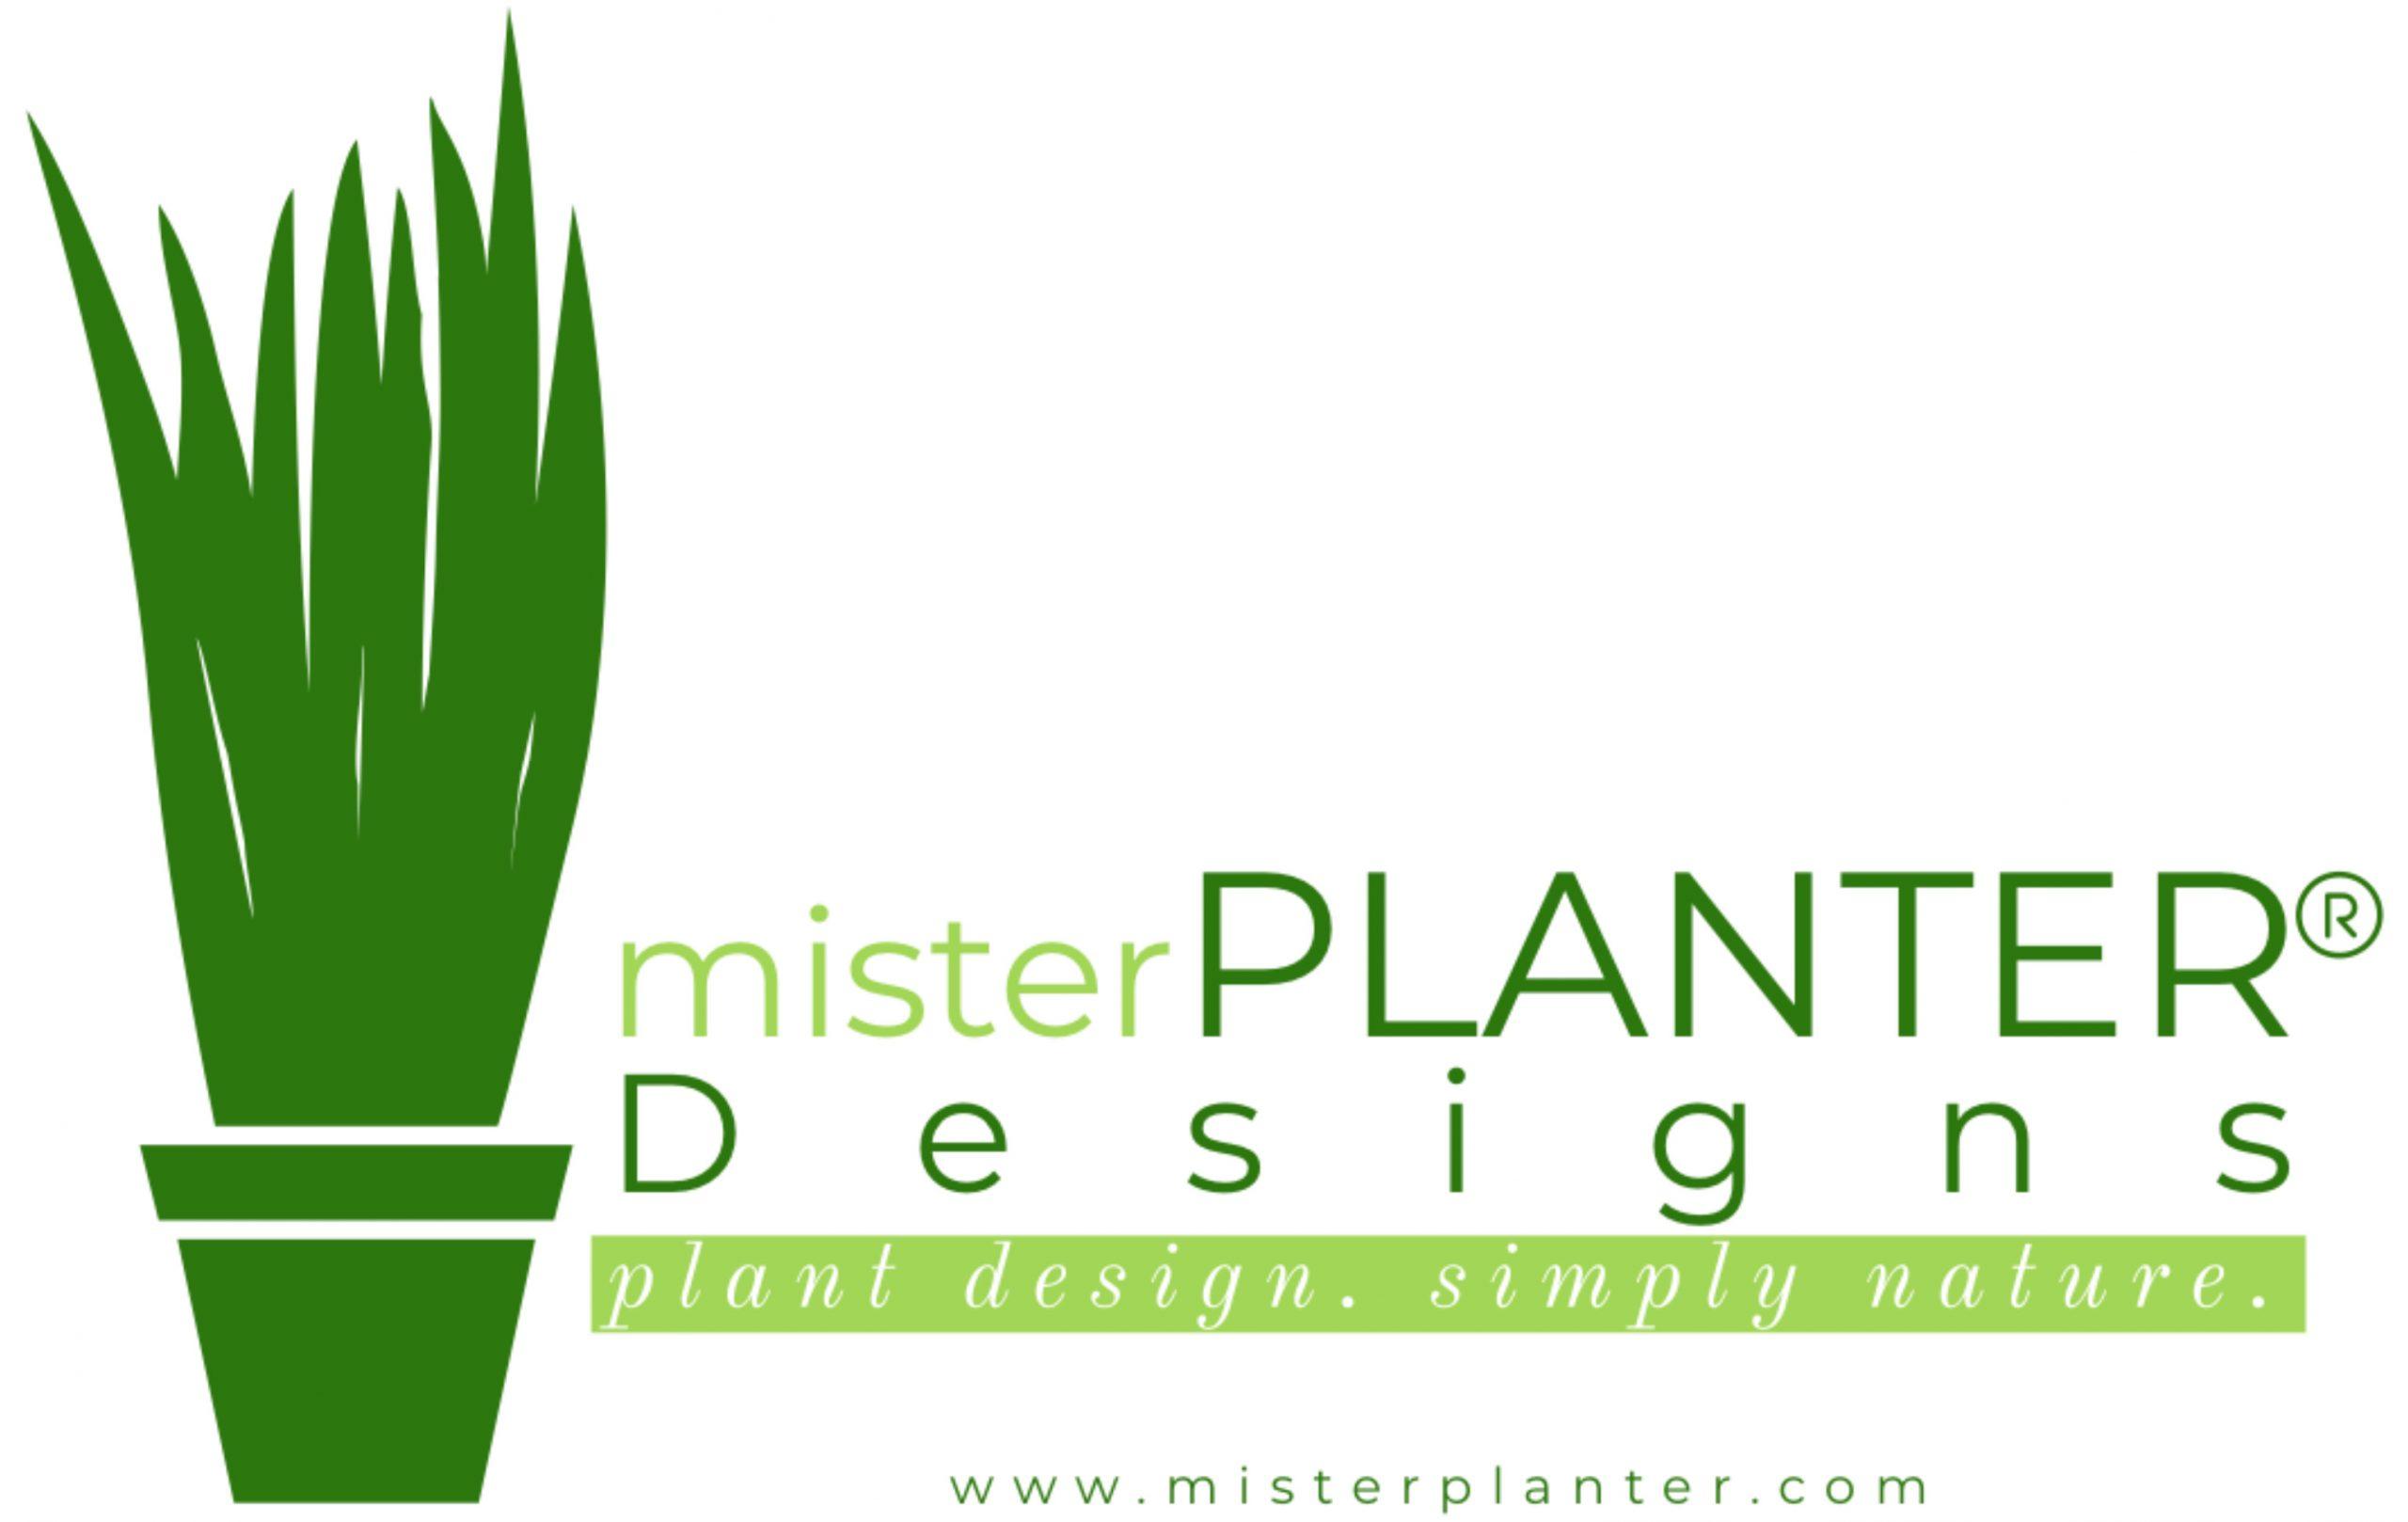 misterPLANTER Designs®